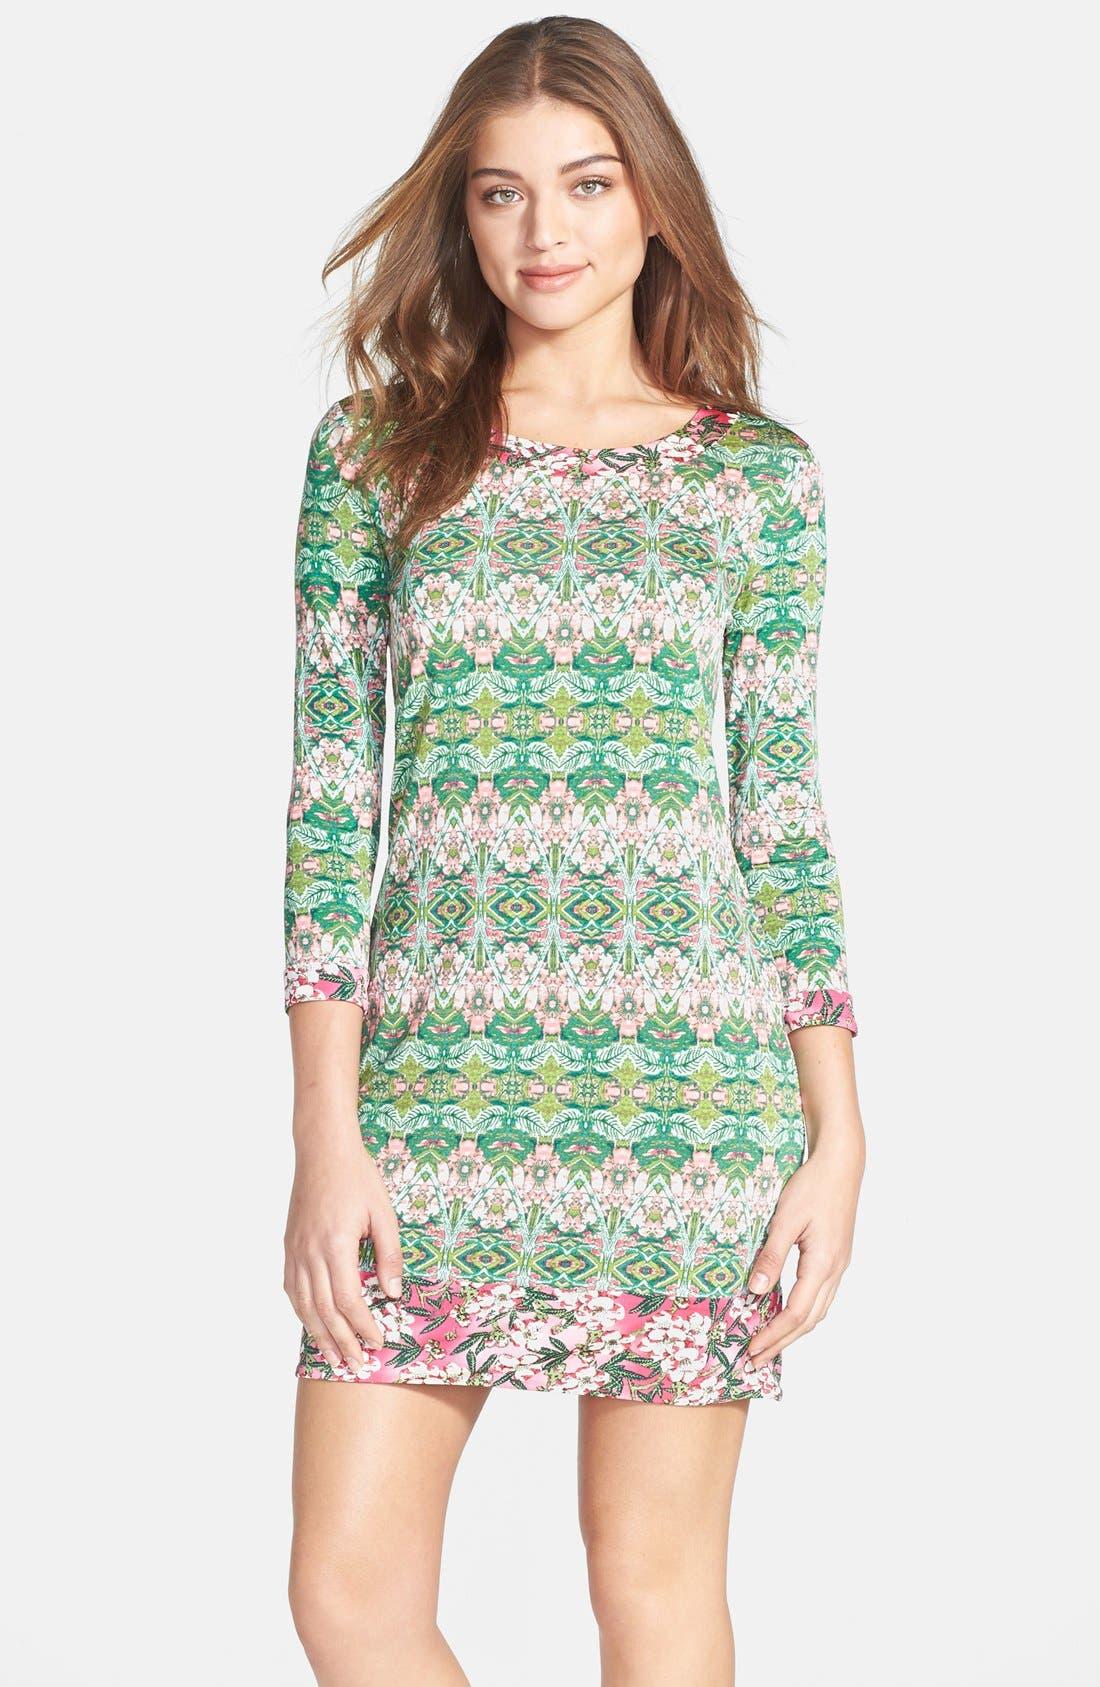 Main Image - BCBGMAXAZRIA 'Ania' Print Jersey Shift Dress